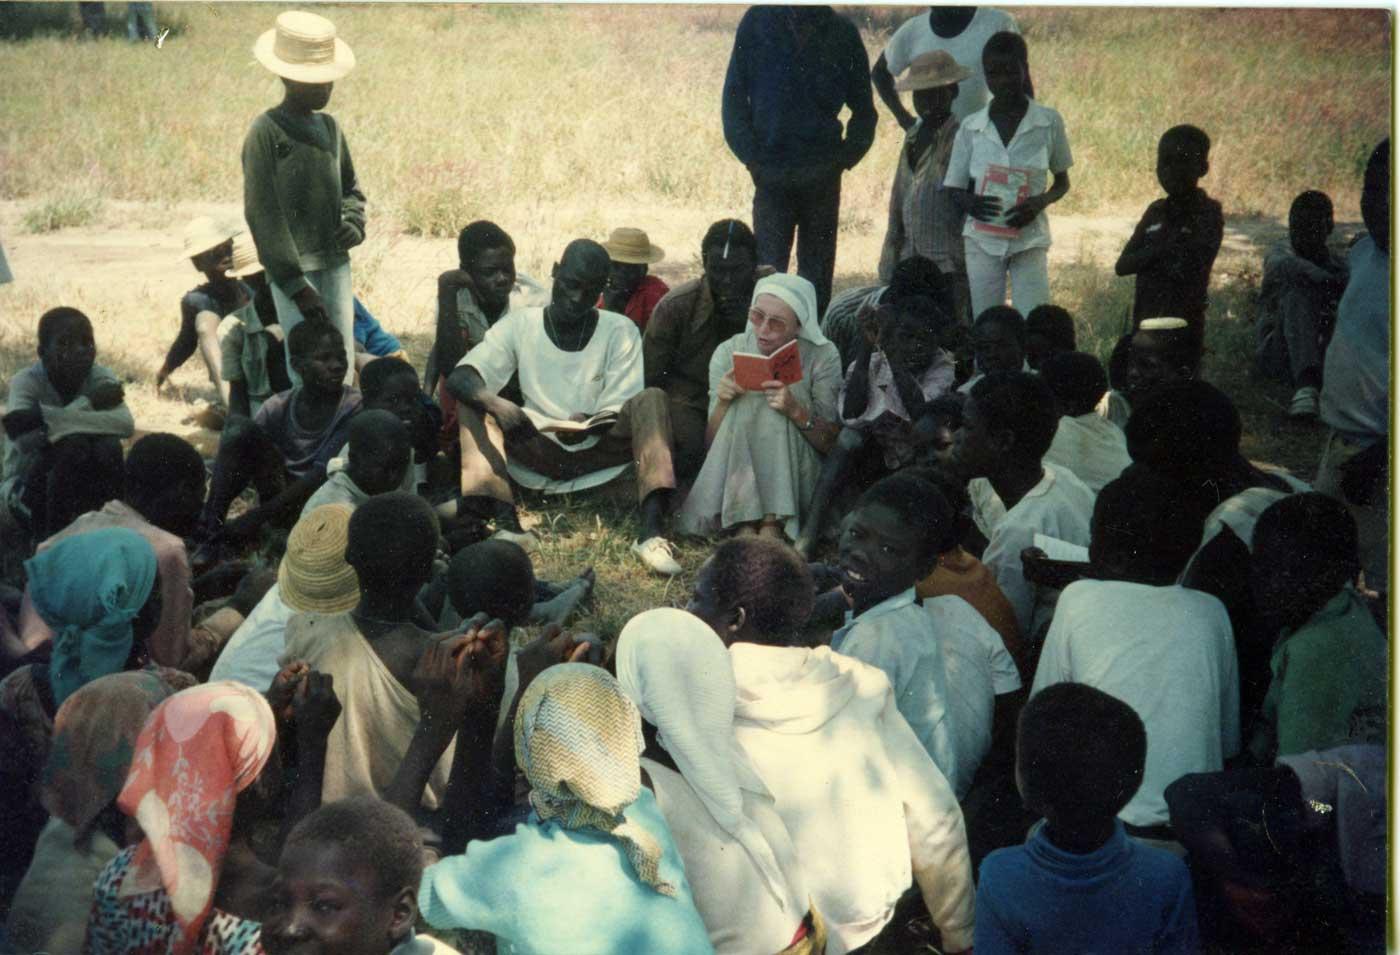 1986, Padermé – Cameroon